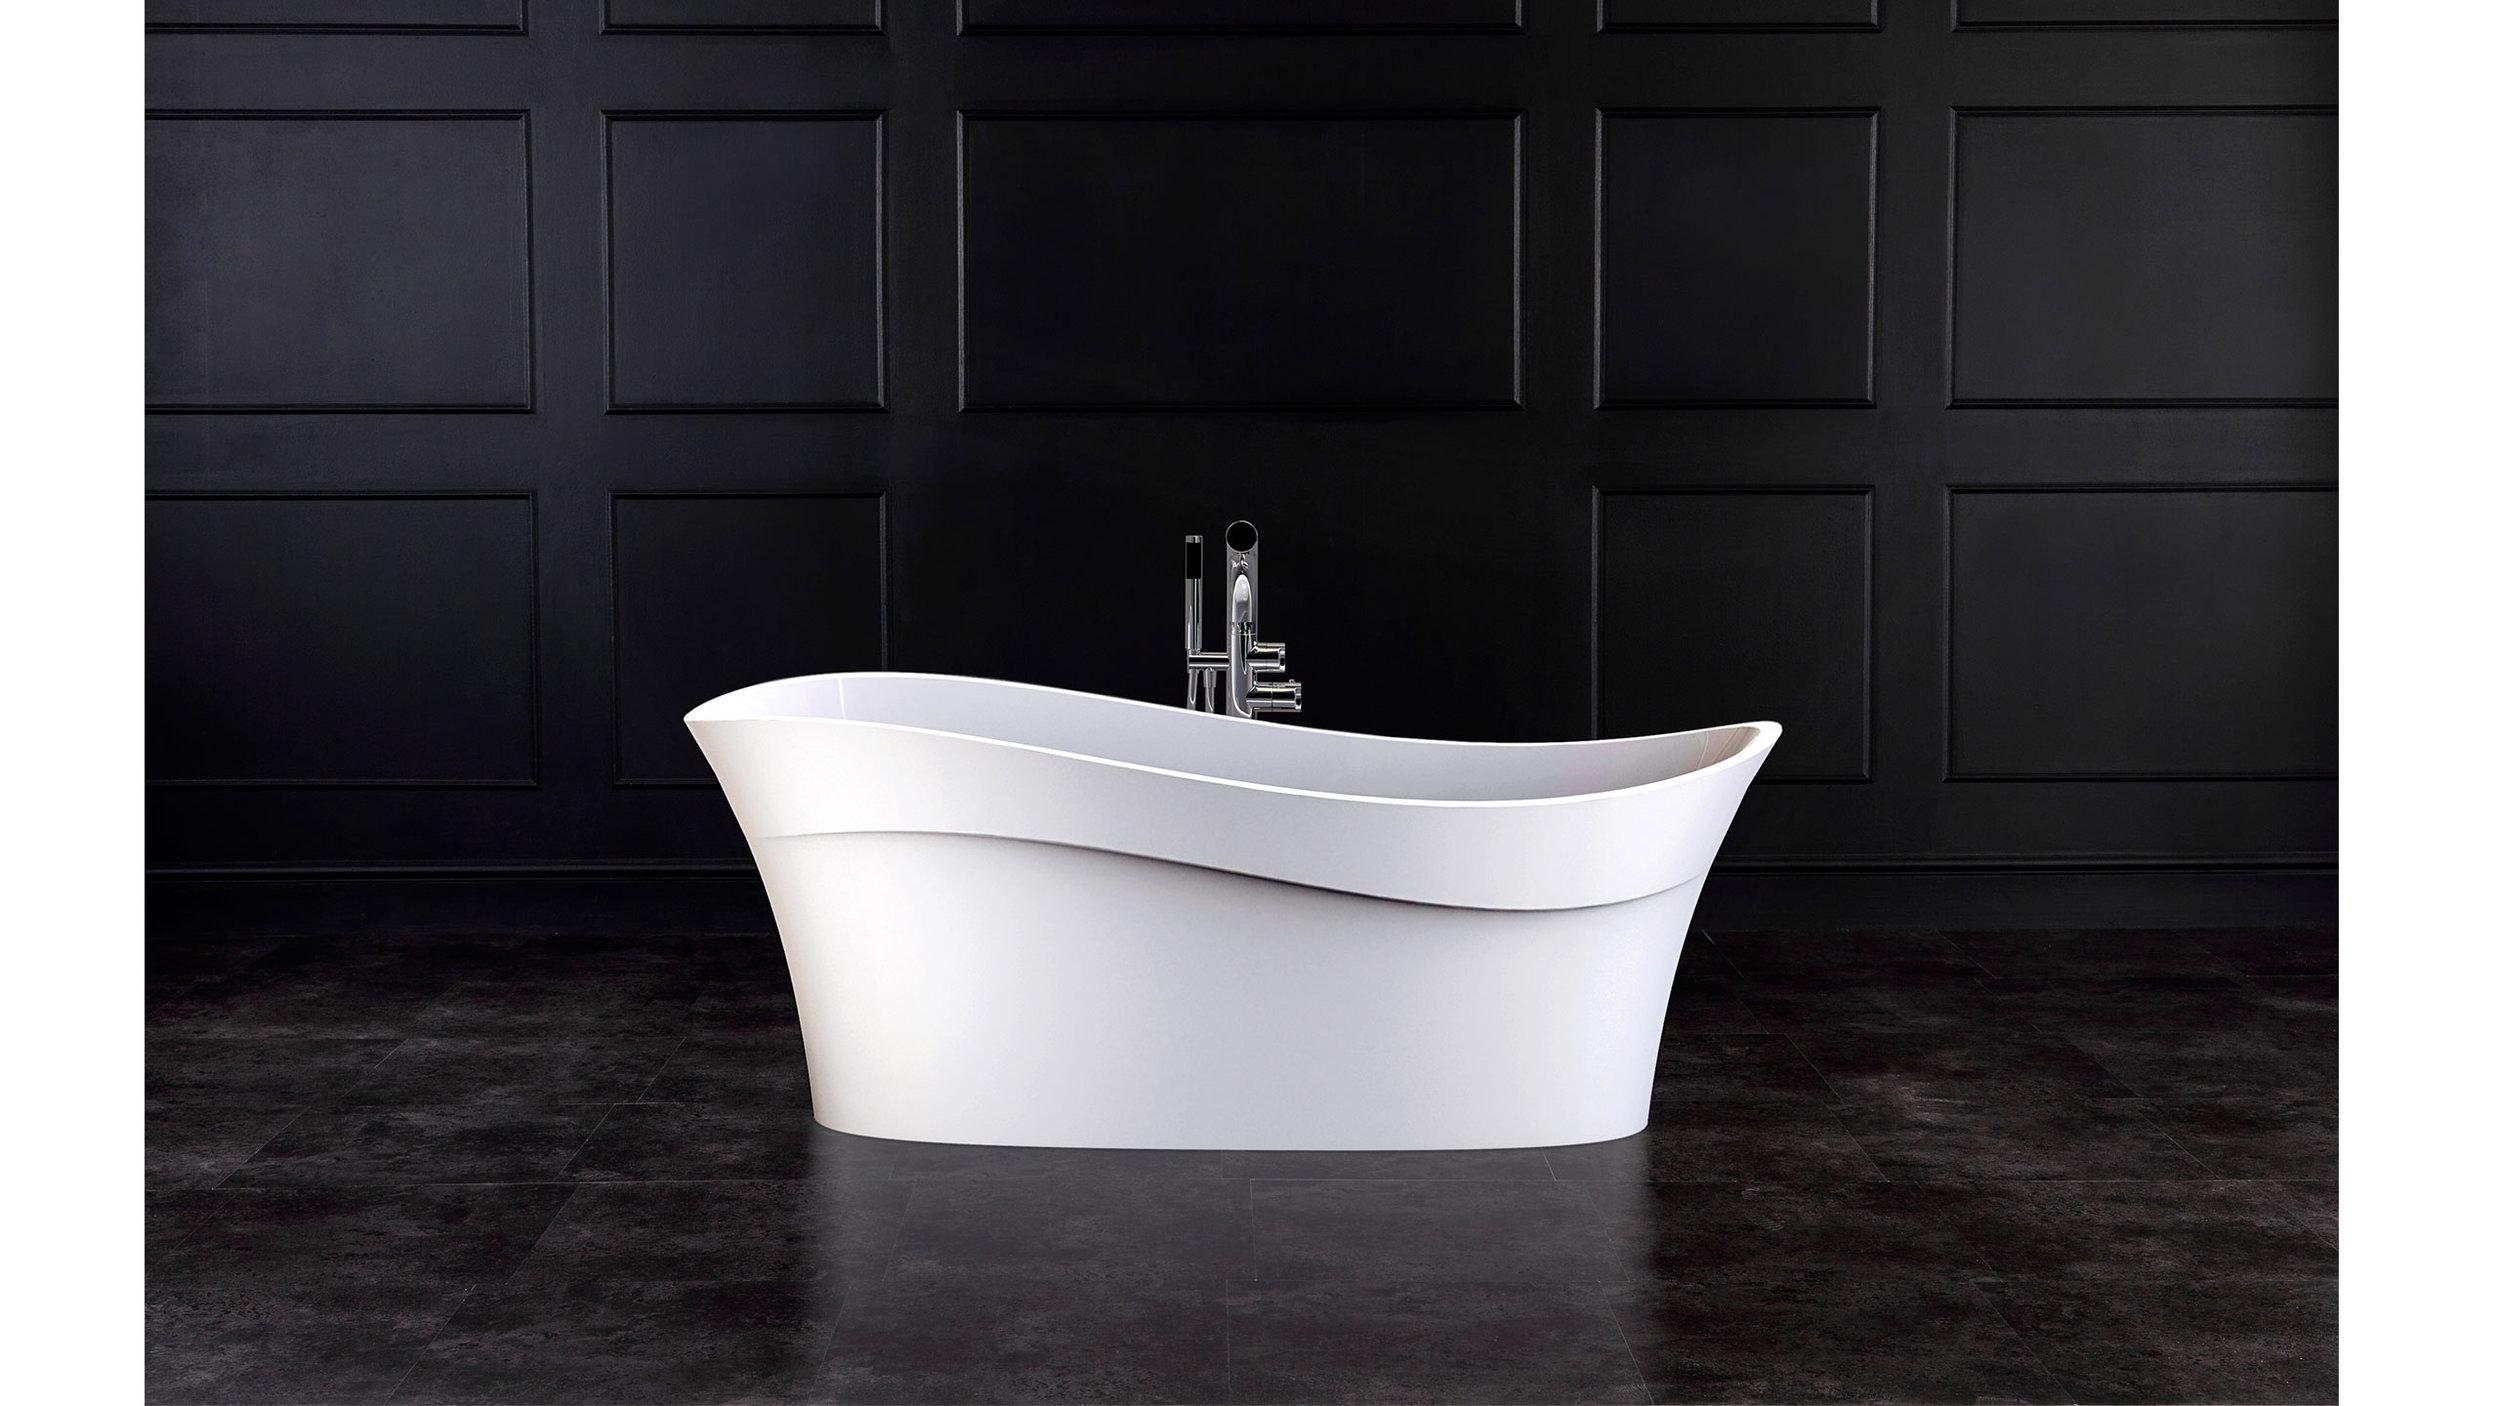 Pescadero-bath-black-panel-v2-.jpg